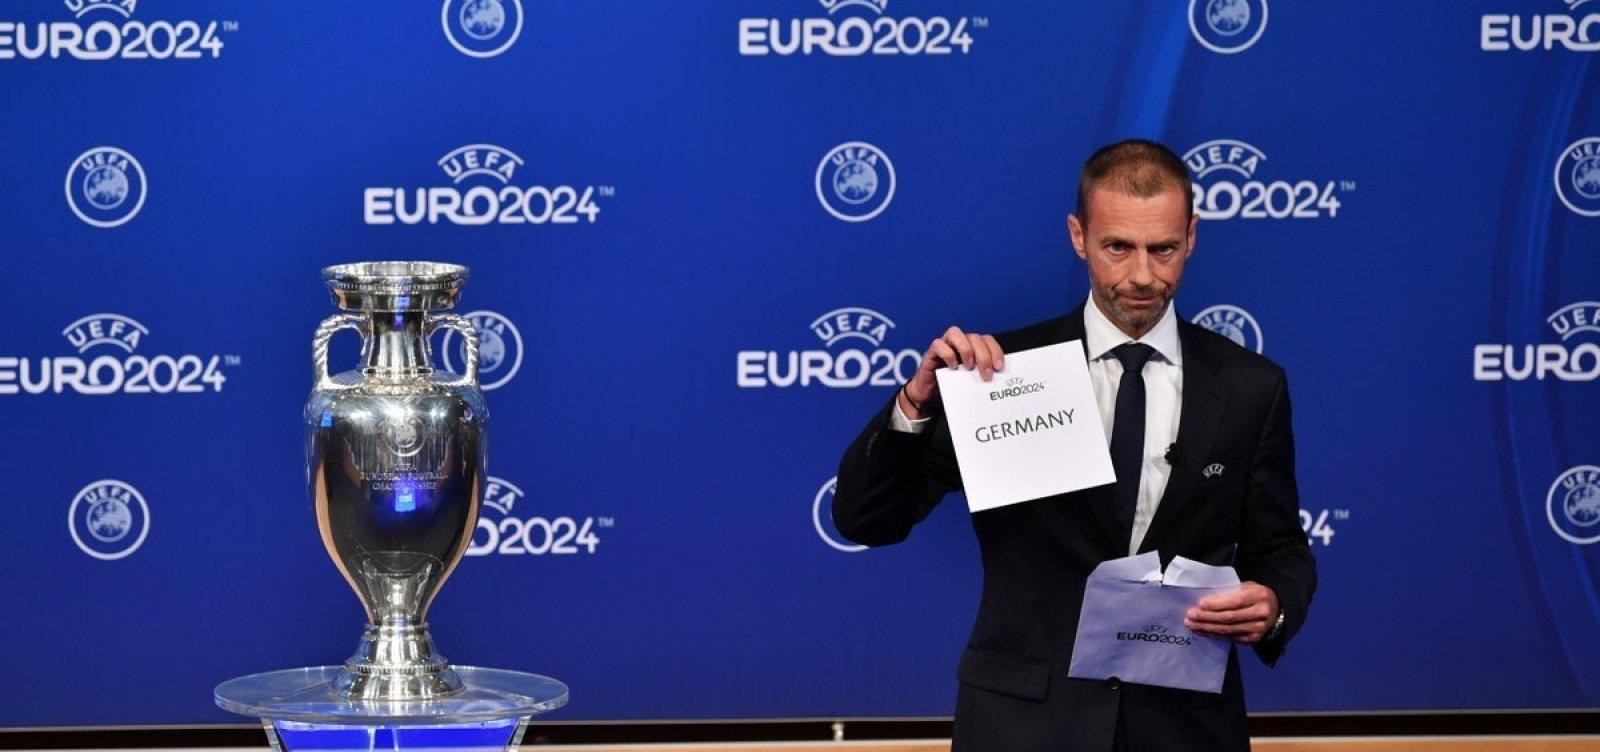 Alemanha é escolhida como sede da Eurocopa 2024